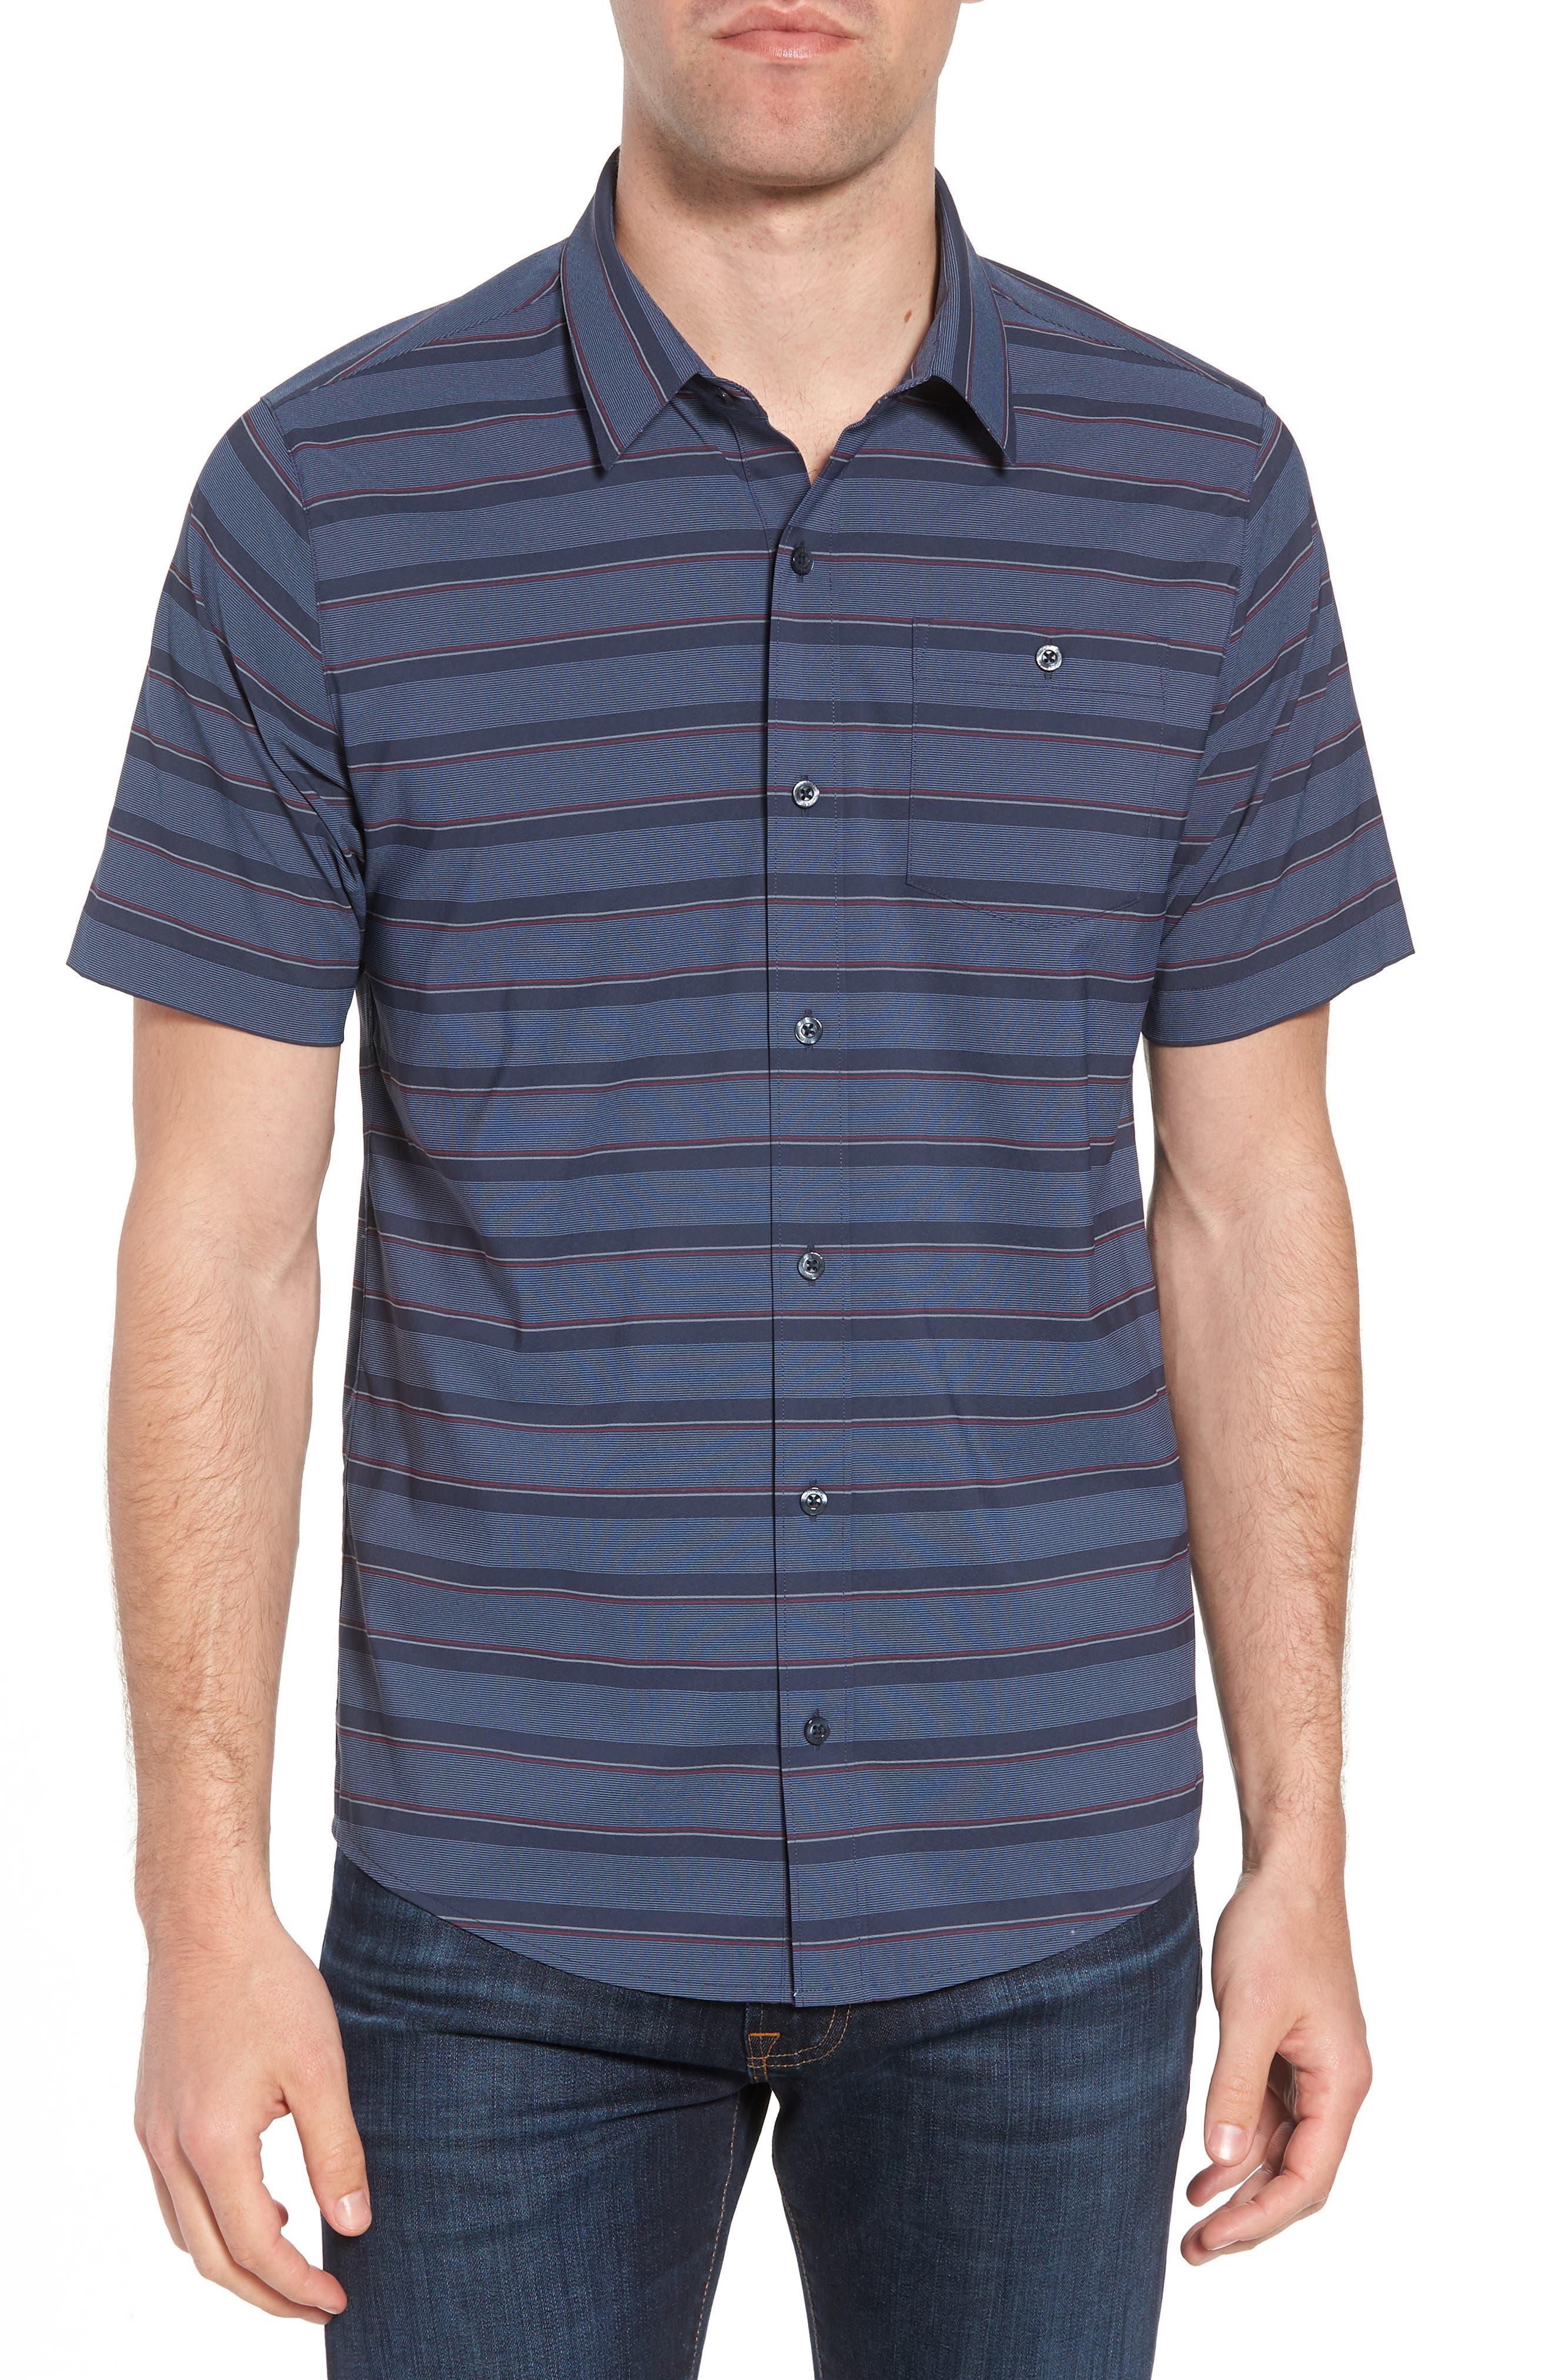 Quiver Regular Fit Sport Shirt,                         Main,                         color, 400